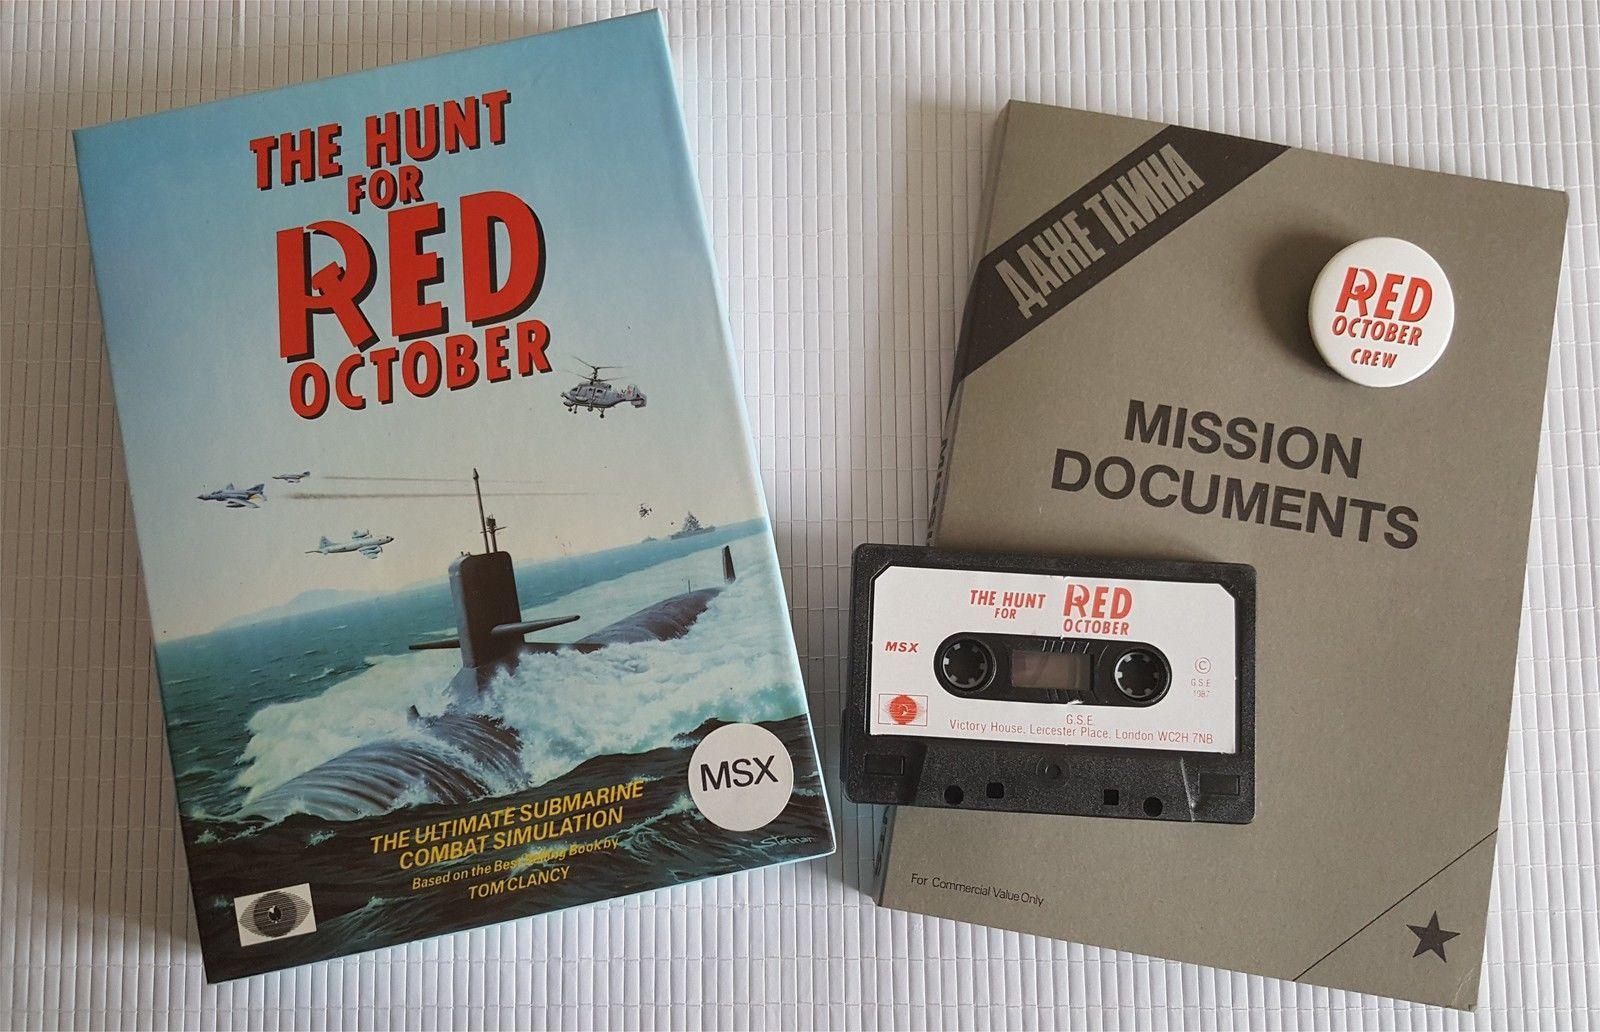 The Hunt for Red October (1987, MSX, Grandslam